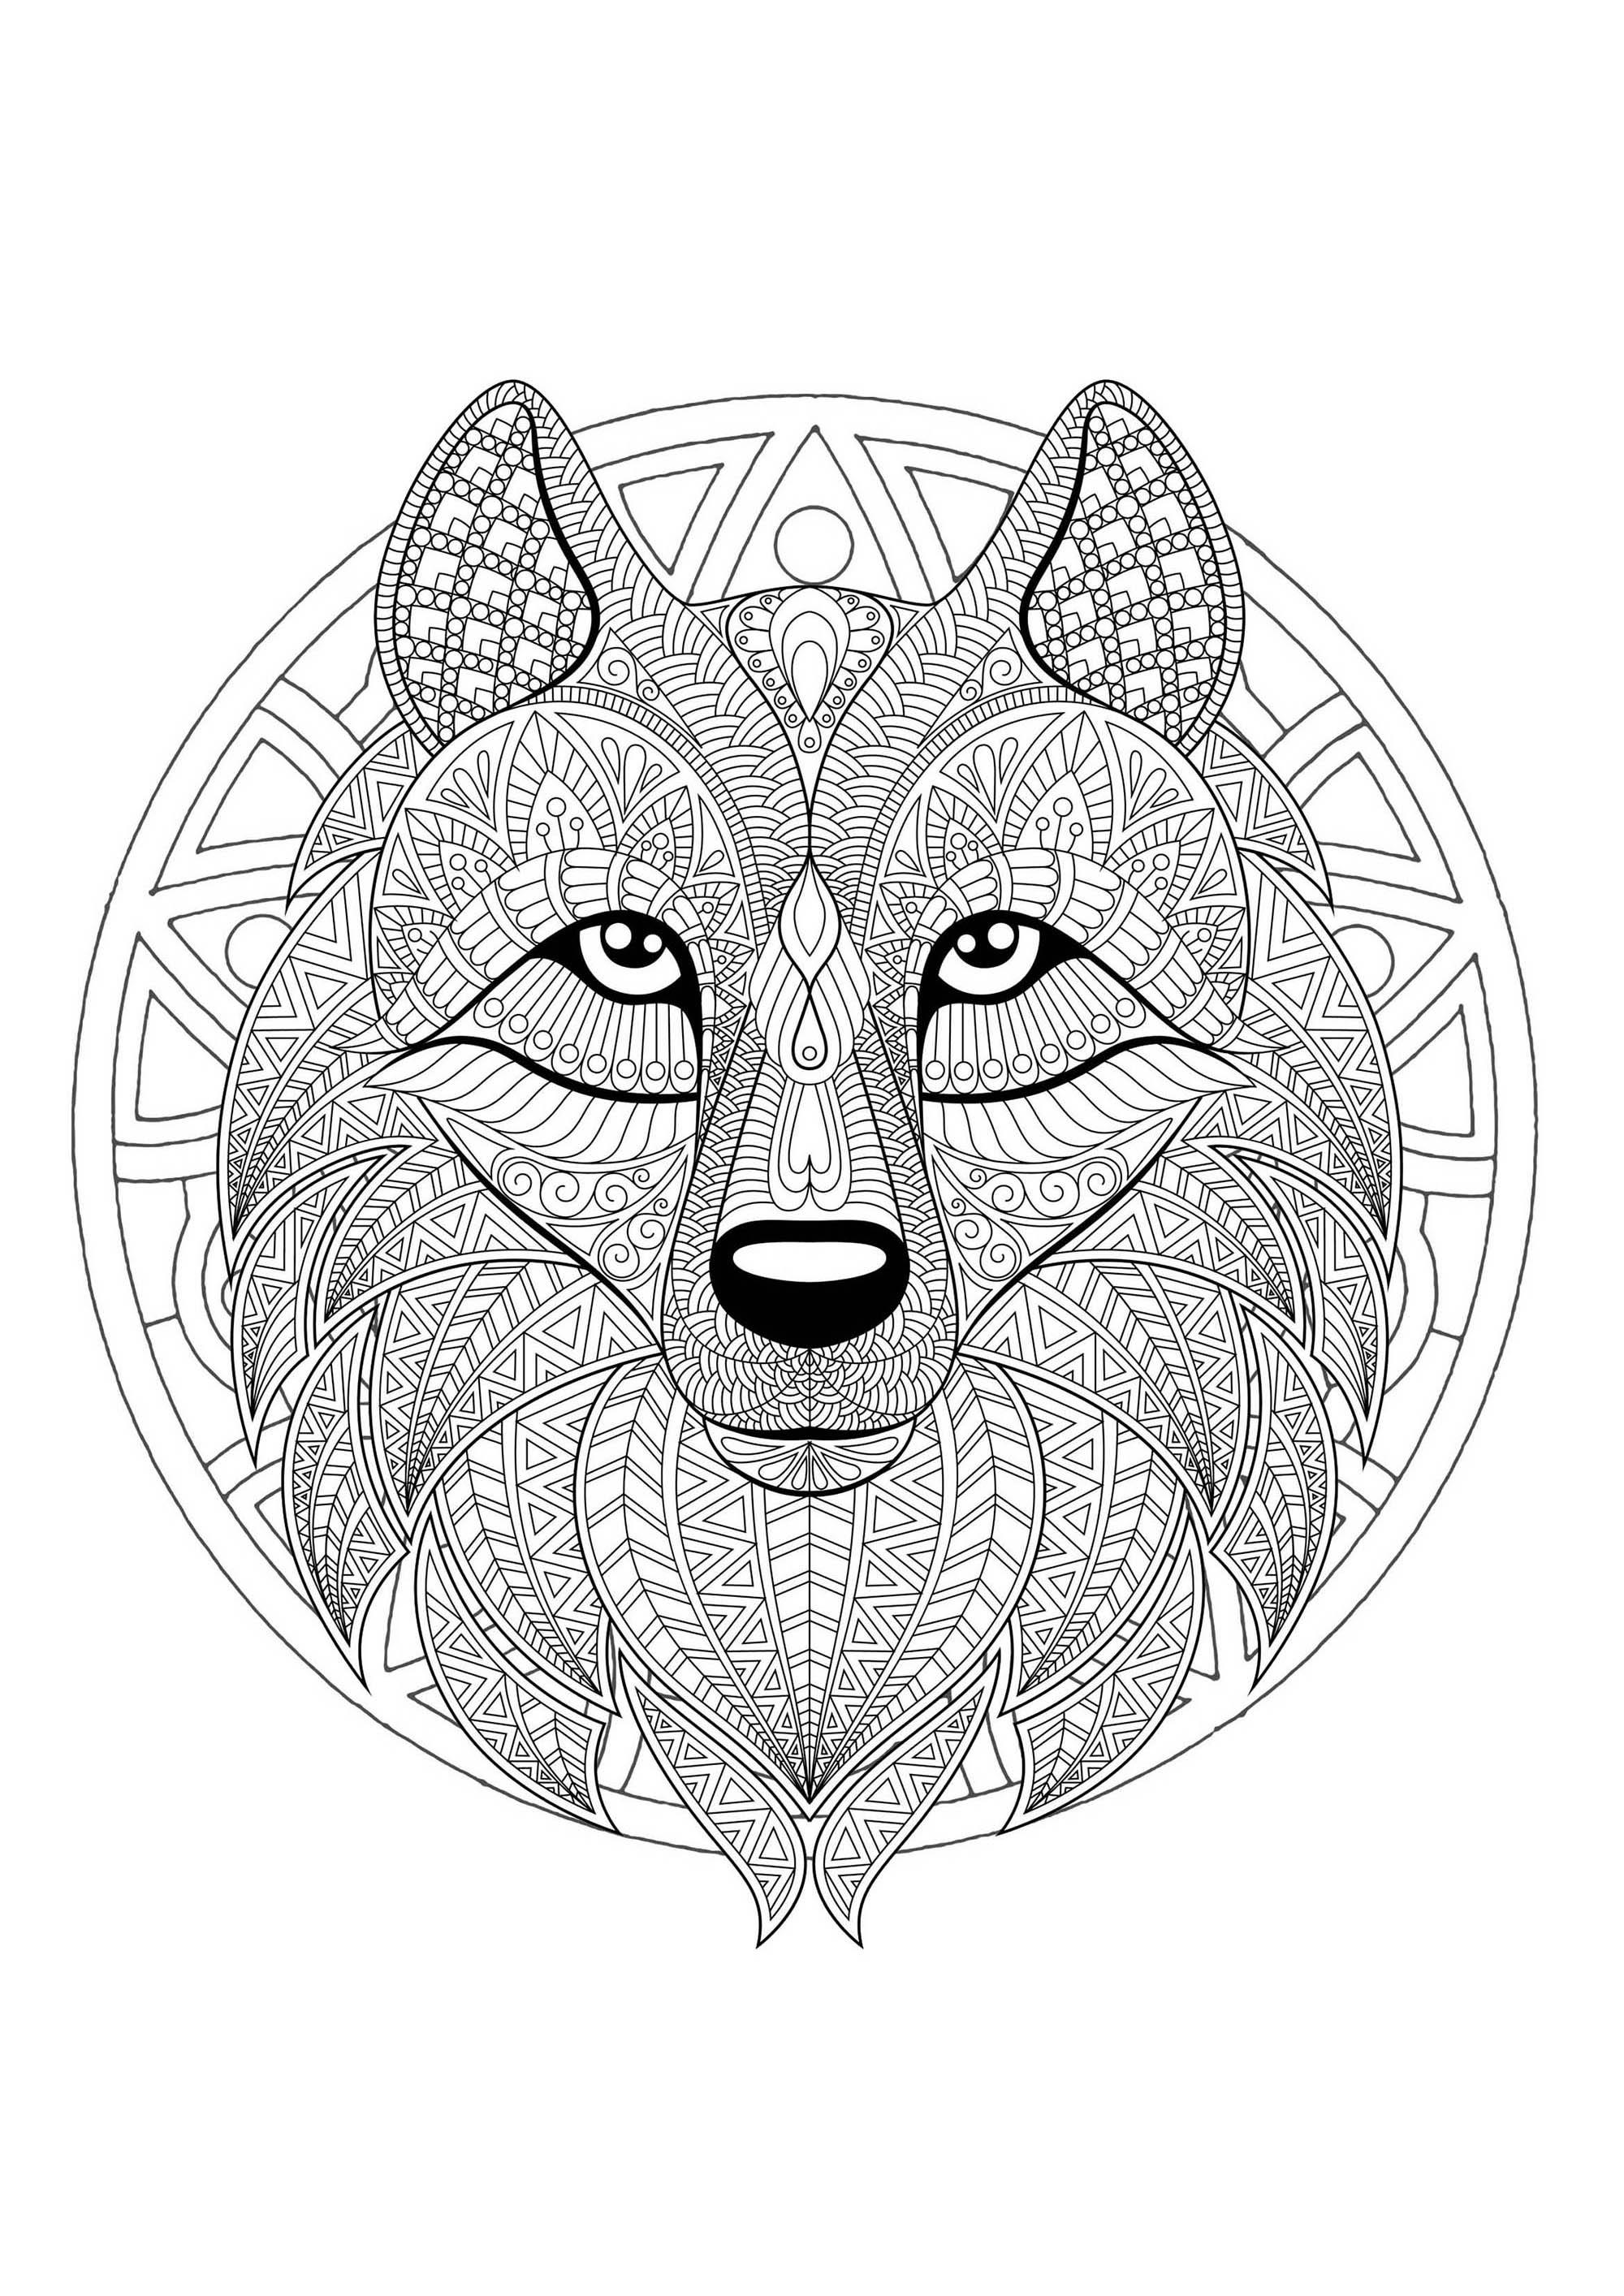 Mandalas 68267 Mandalas Malbuch Fur Erwachsene